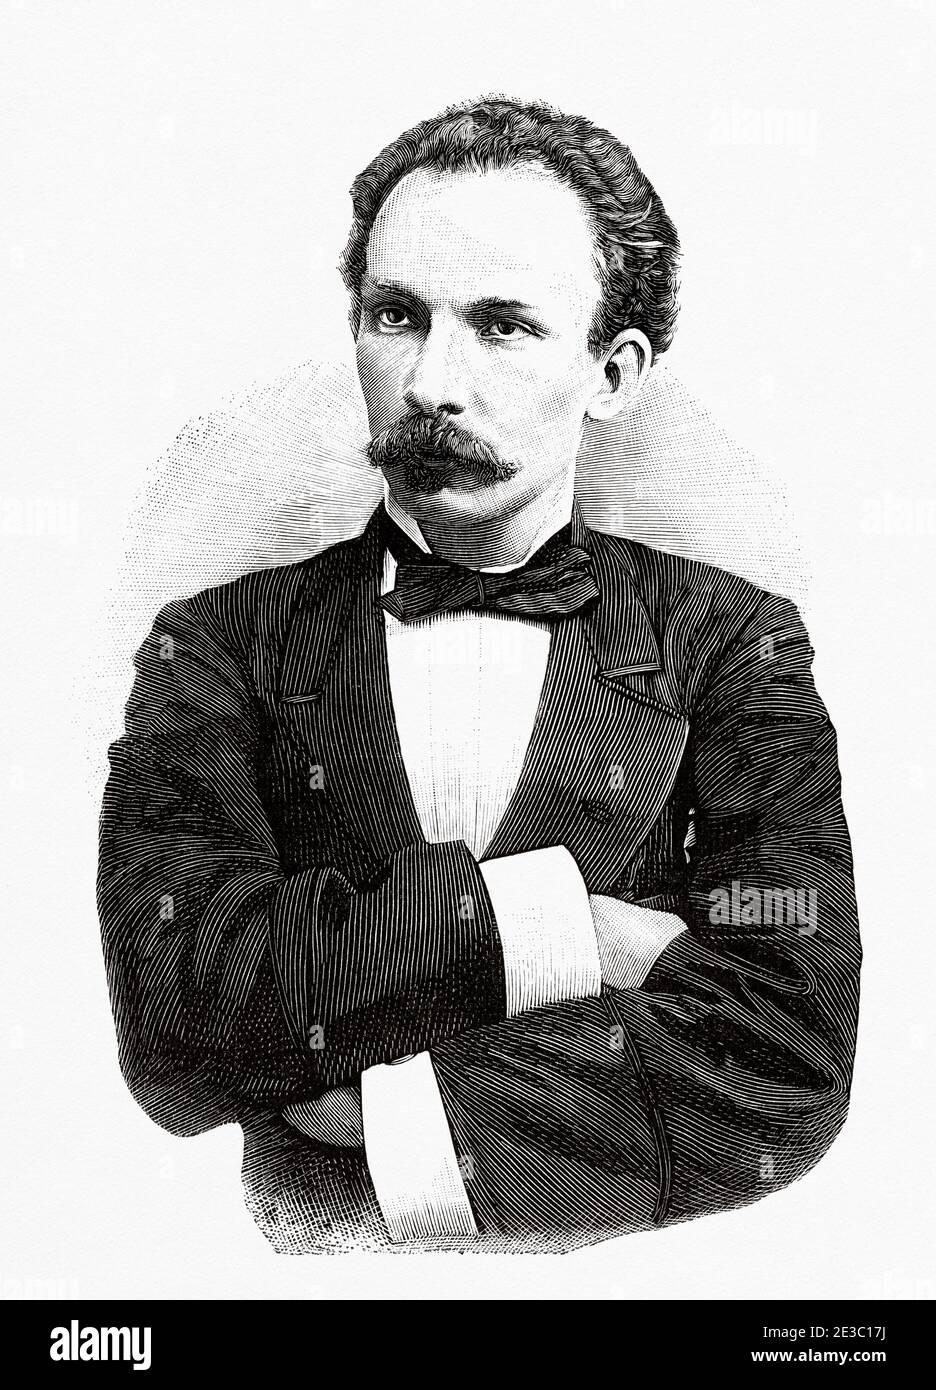 HistoricalFindings Photo: Jose Marti National Hero of Cuba 1890s,Marti Jose